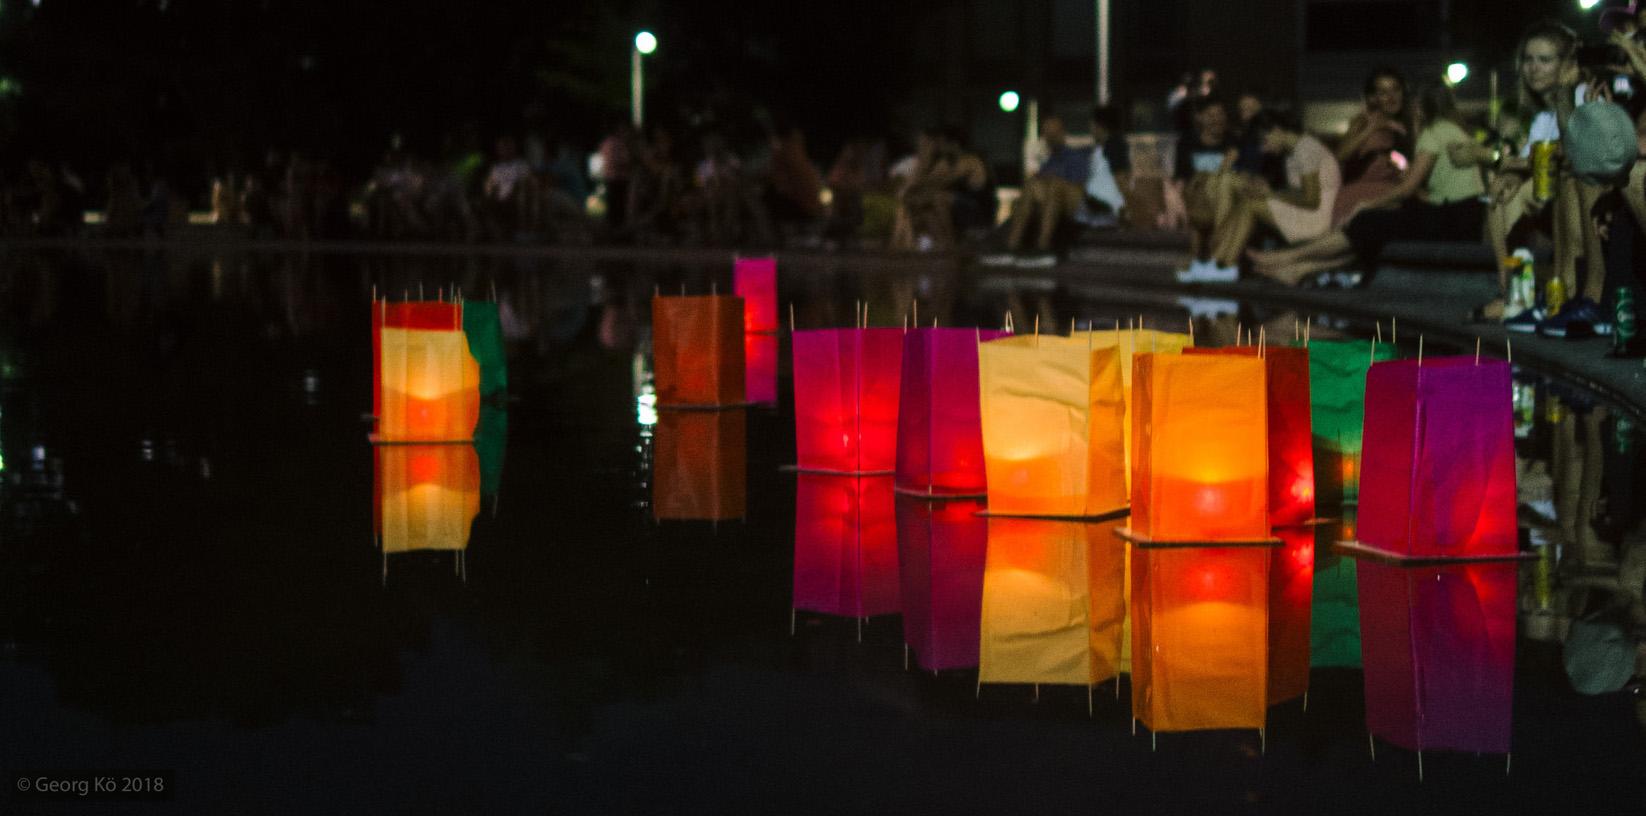 Hiroshima Tag 2018, Wien, Karlsplatz